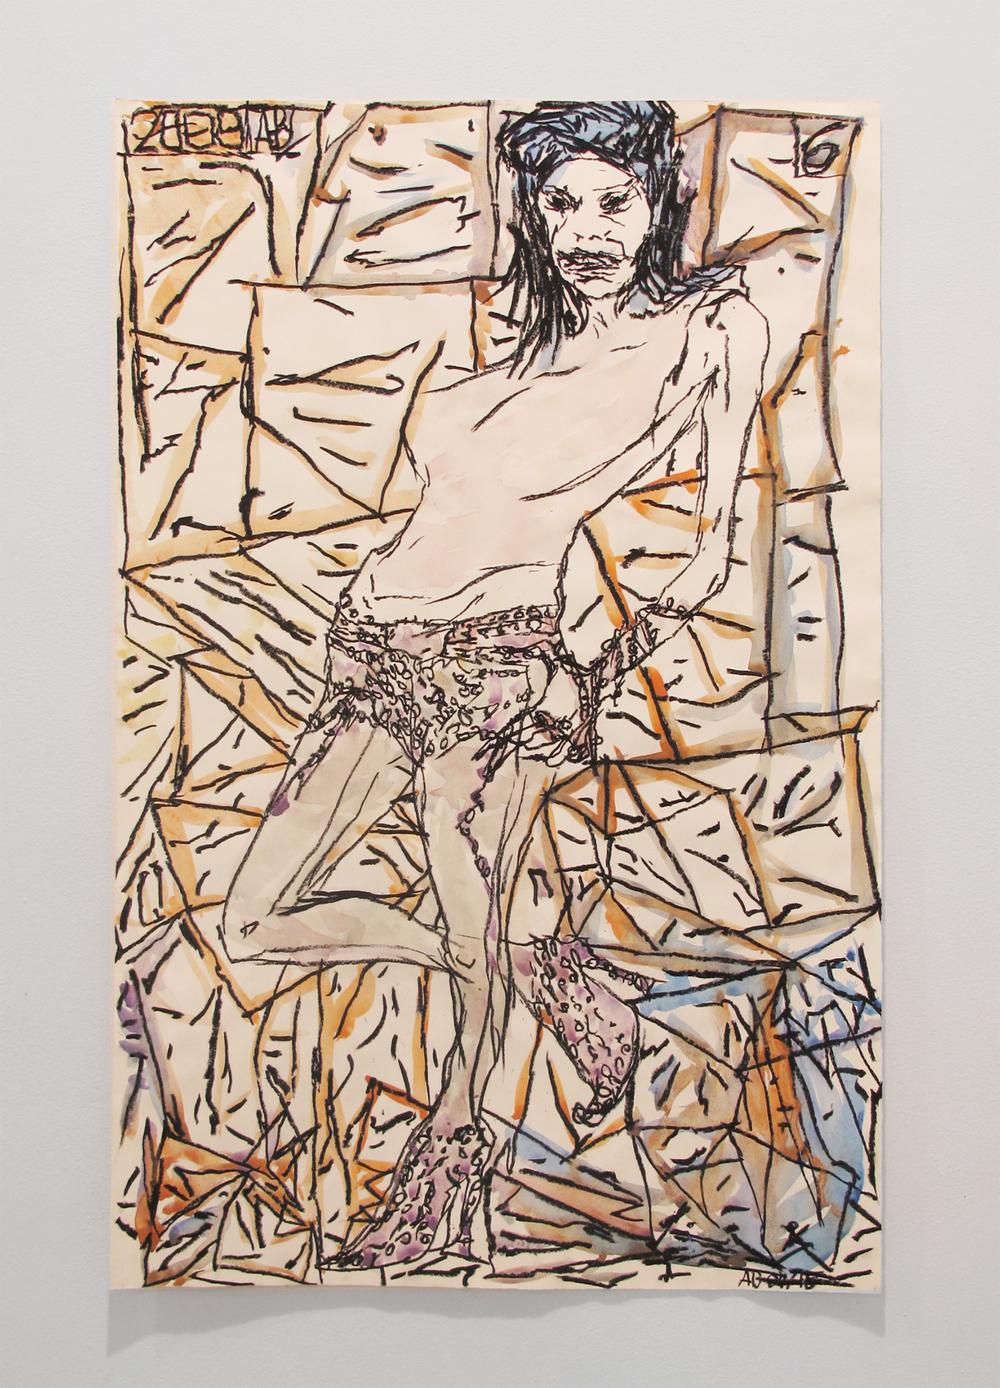 Aidas Bareikis, Solo 002 , 2009-15, paper, oil pastel, watercolor, 40 x 26 in